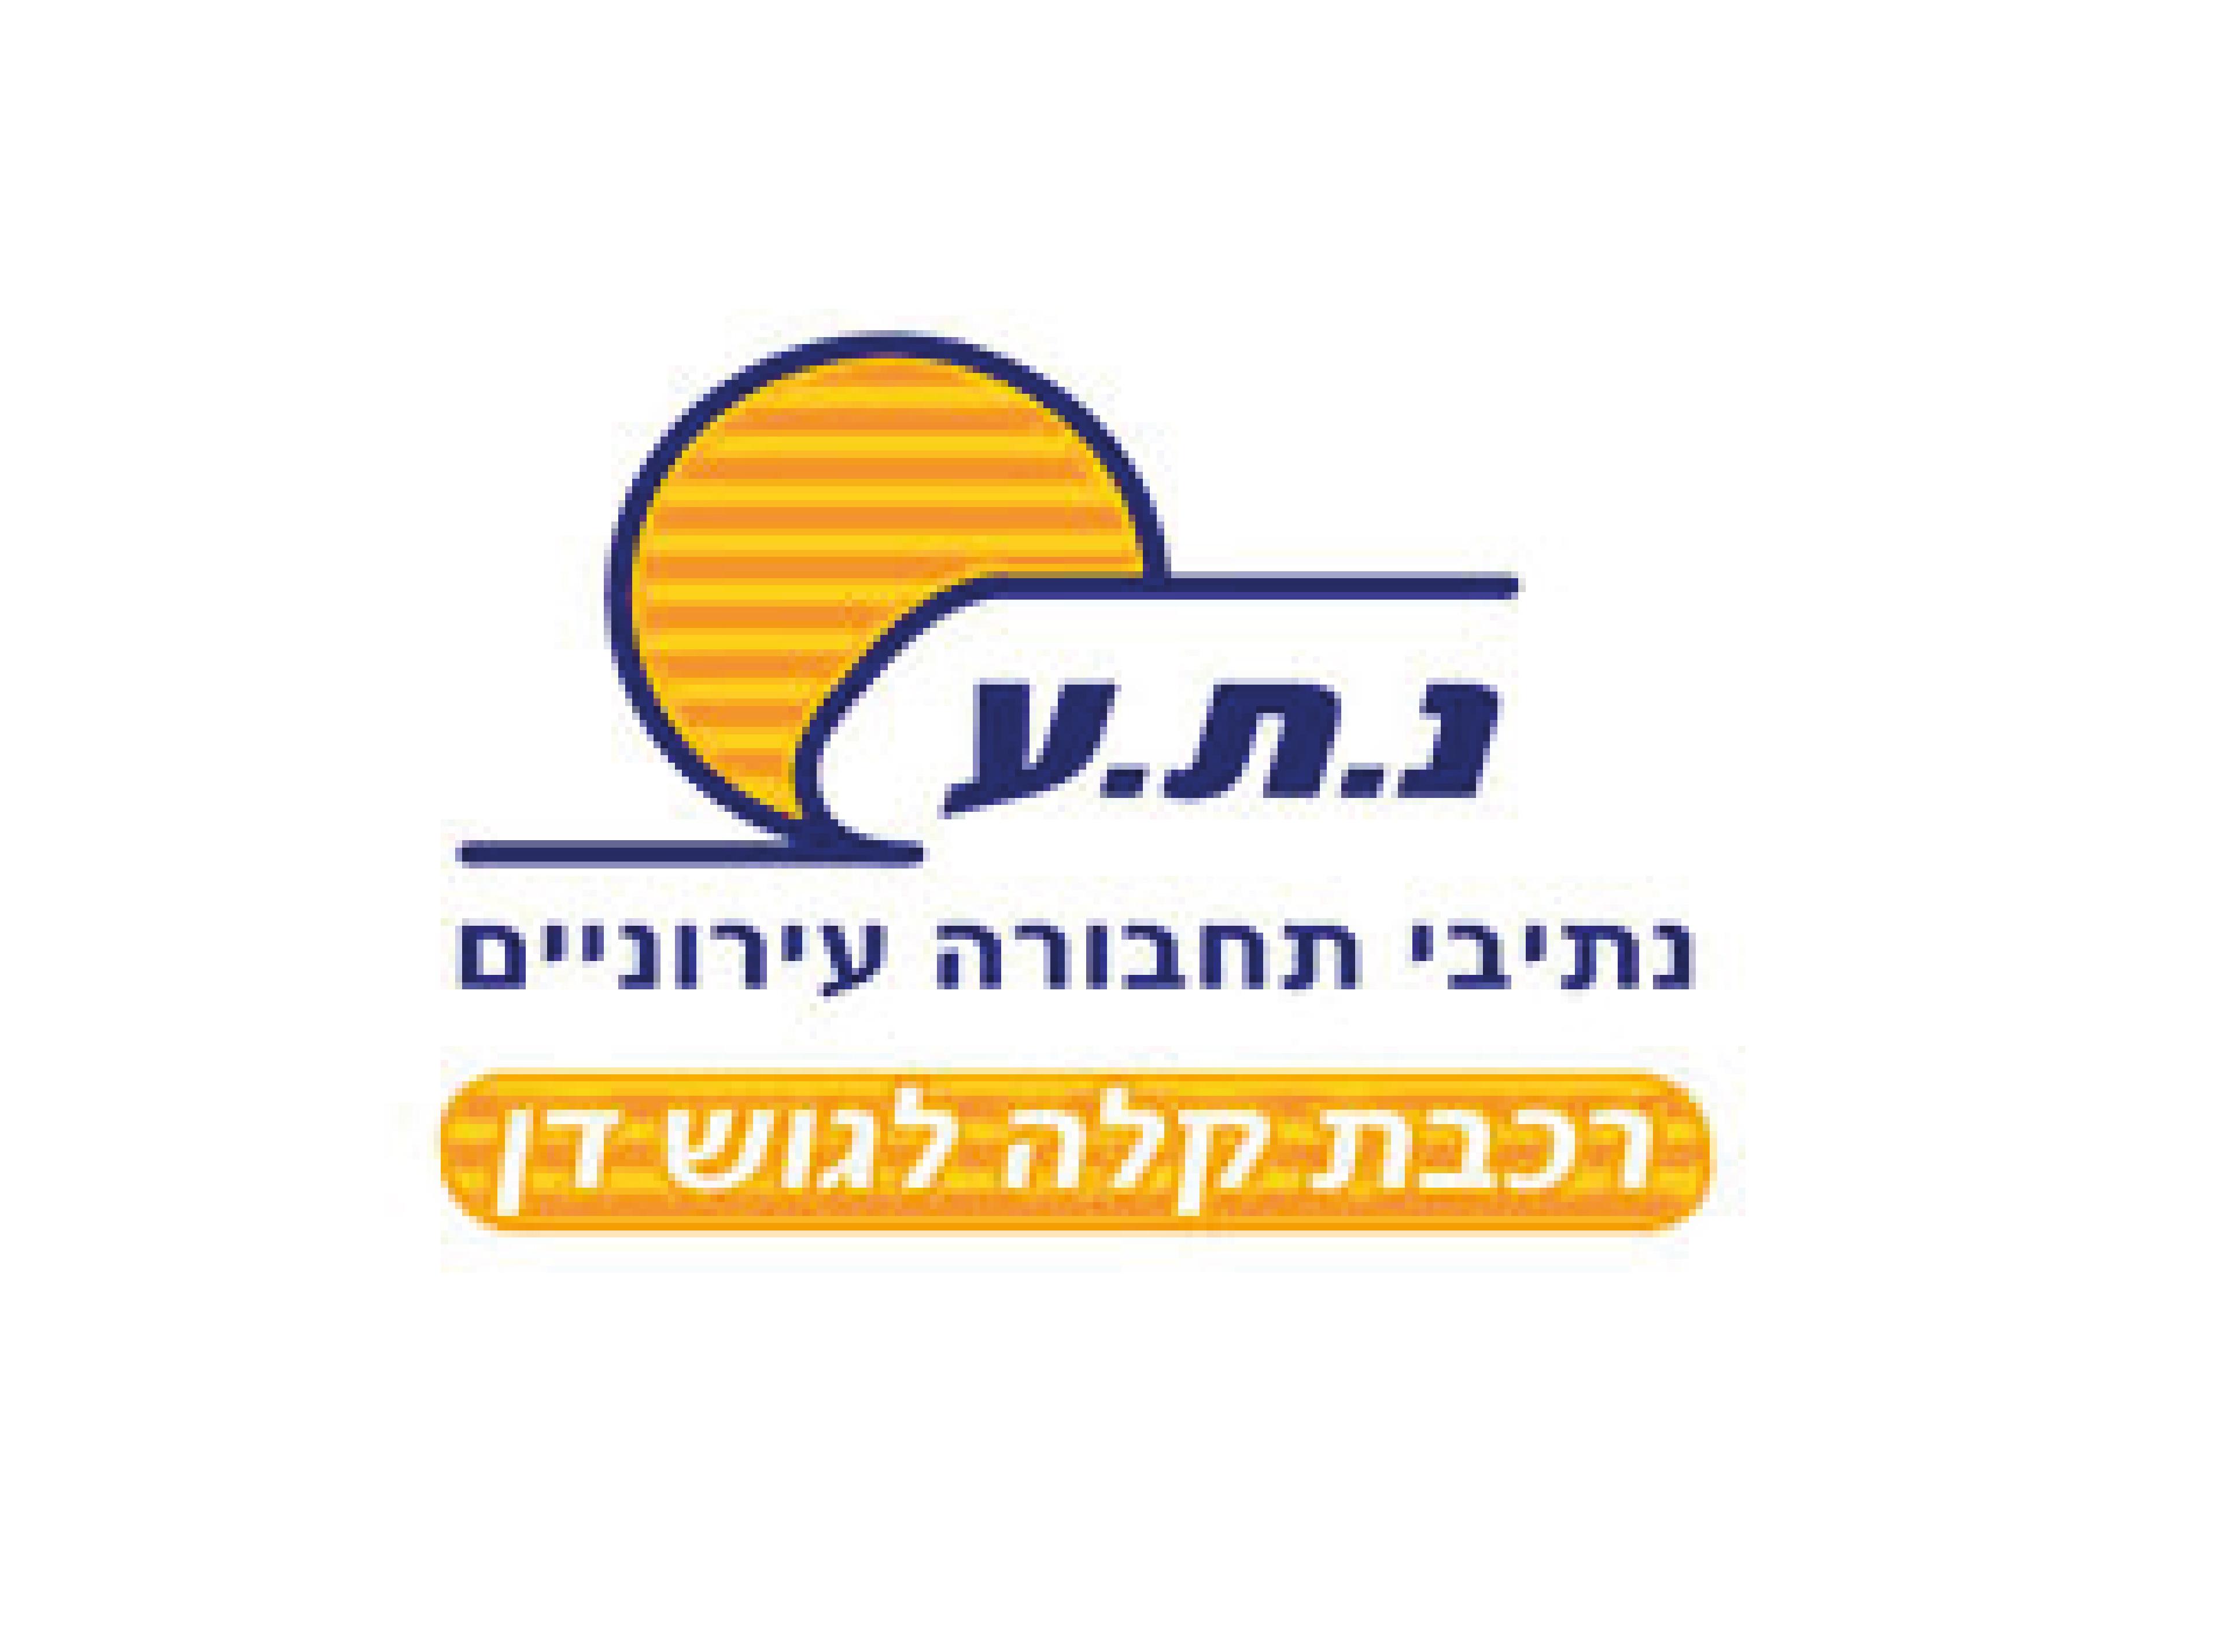 logos-gallery-05